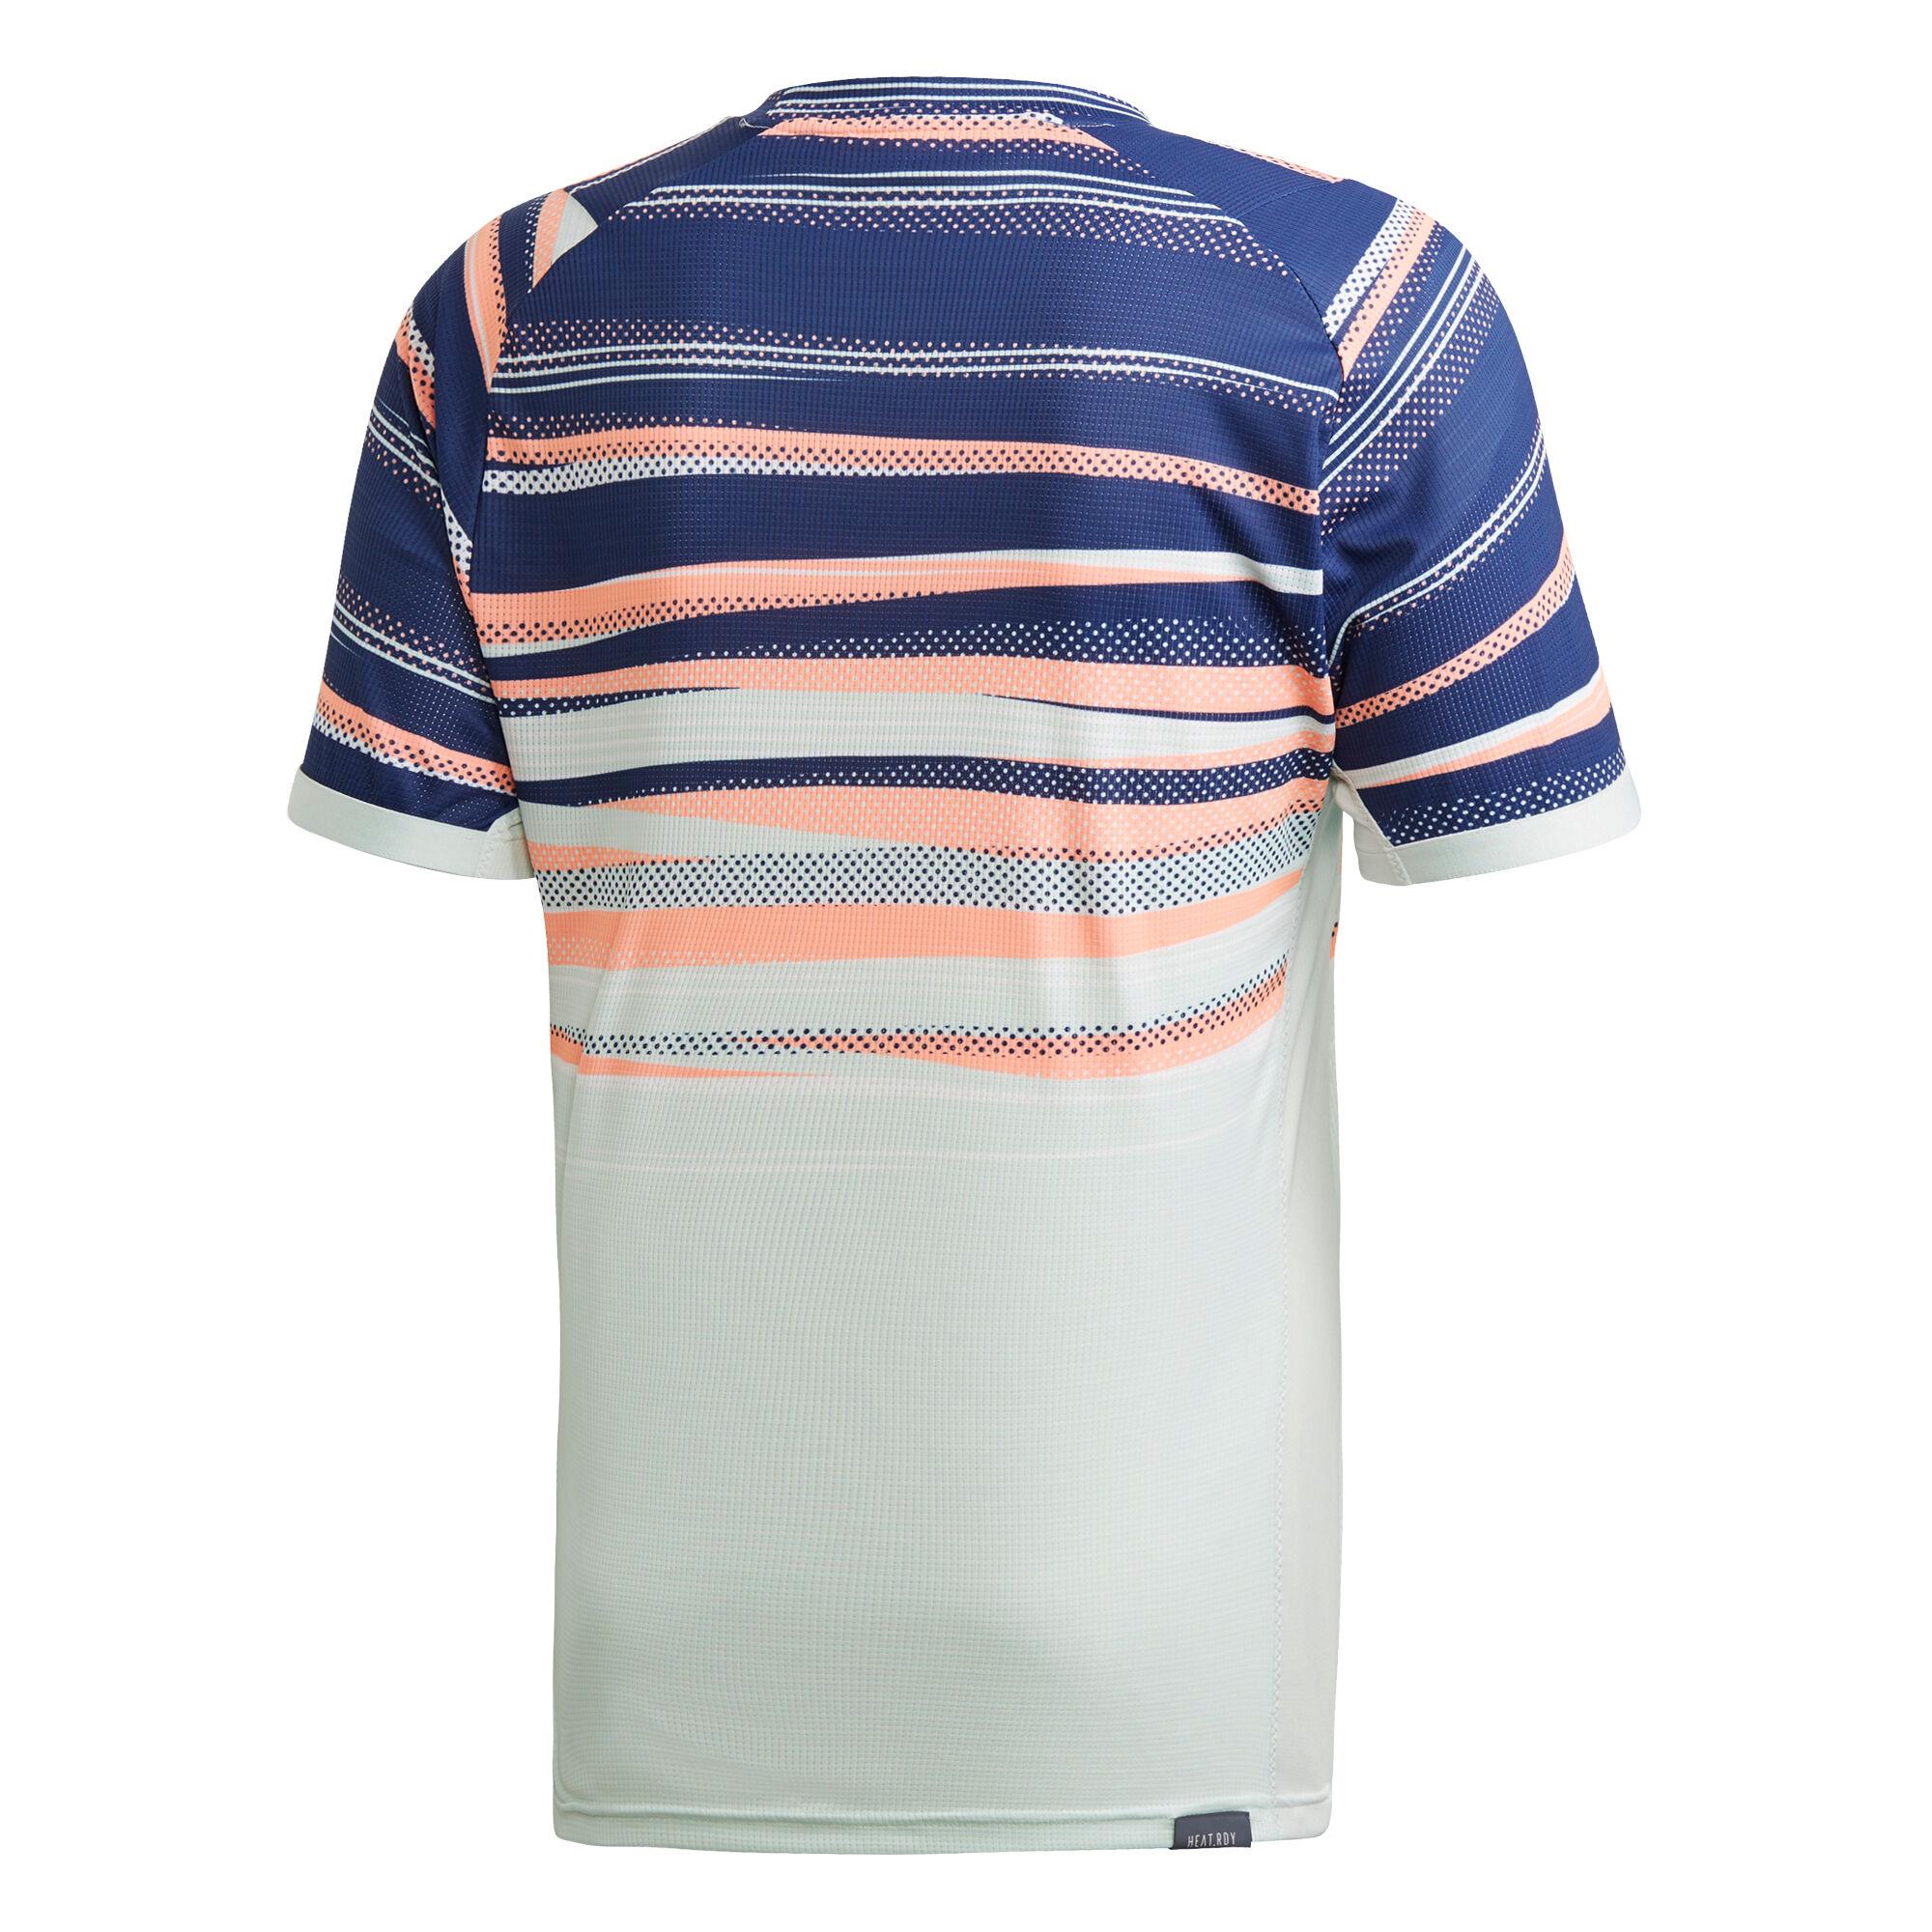 adidas Australian Open Zverev T shirt Heren Mint, Donkerblauw